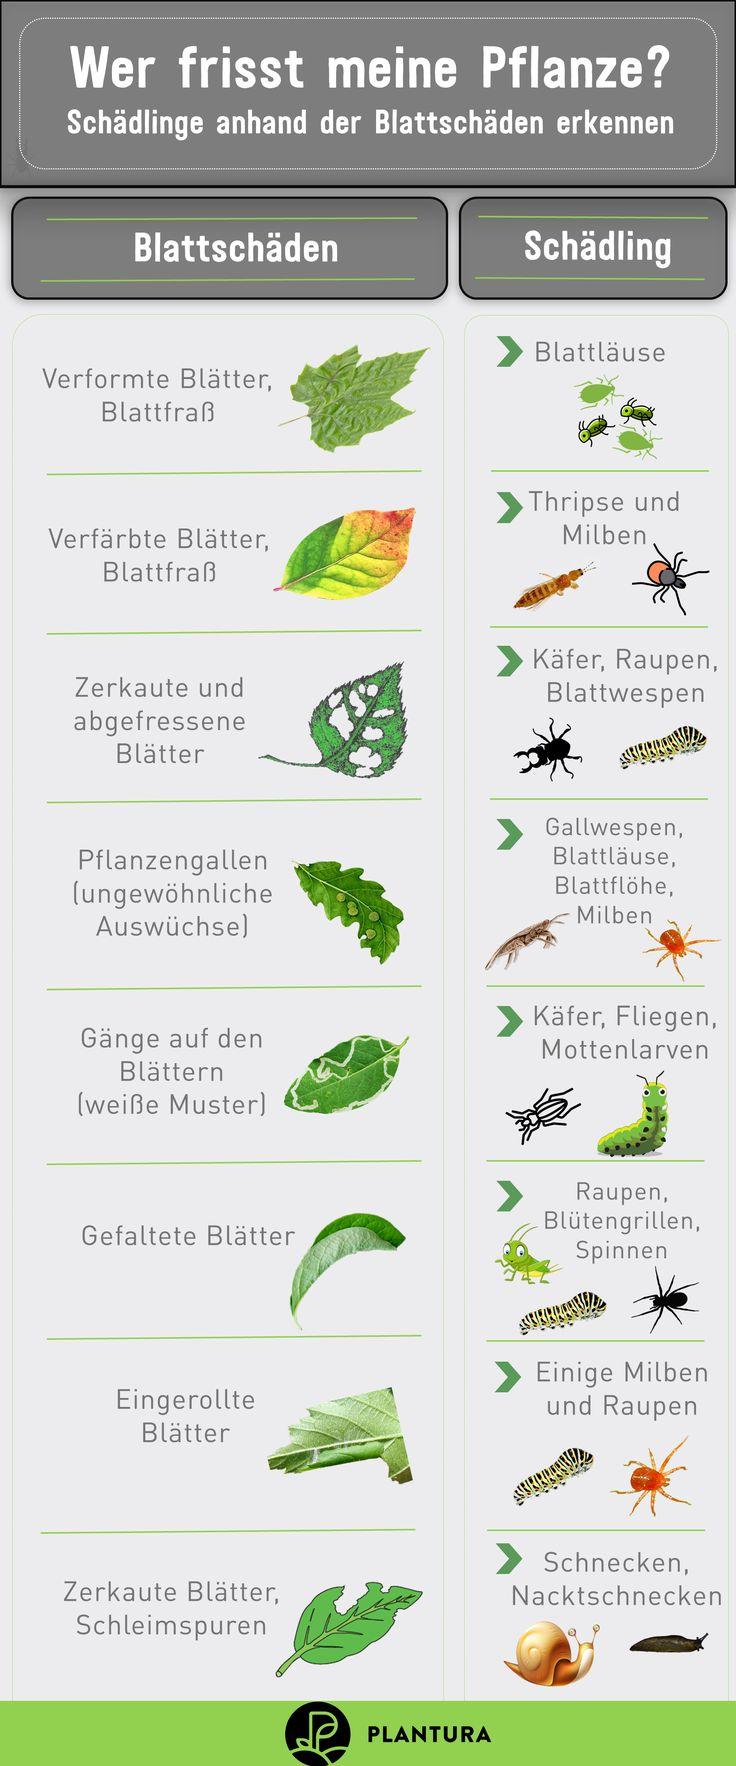 10 Hausmittel gegen Schädlinge im Garten – Plantura | Garten Ideen & Tipps | Gemüse, Obst, Kräuter